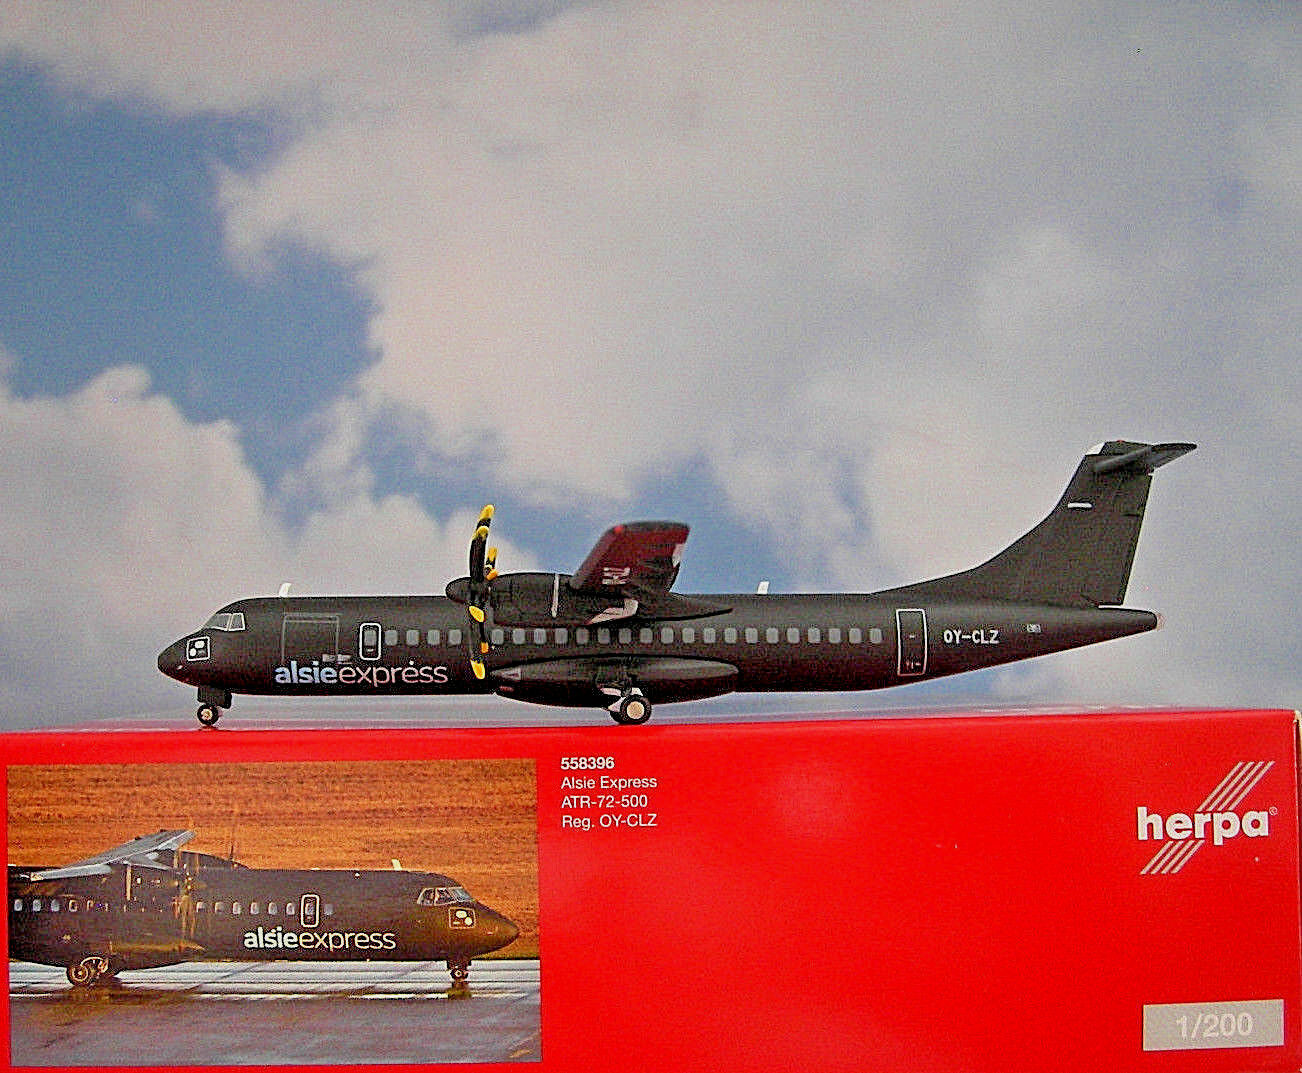 Herpa Wings 1 200 ATR 72-500 alsieexpress OY-clz 558396